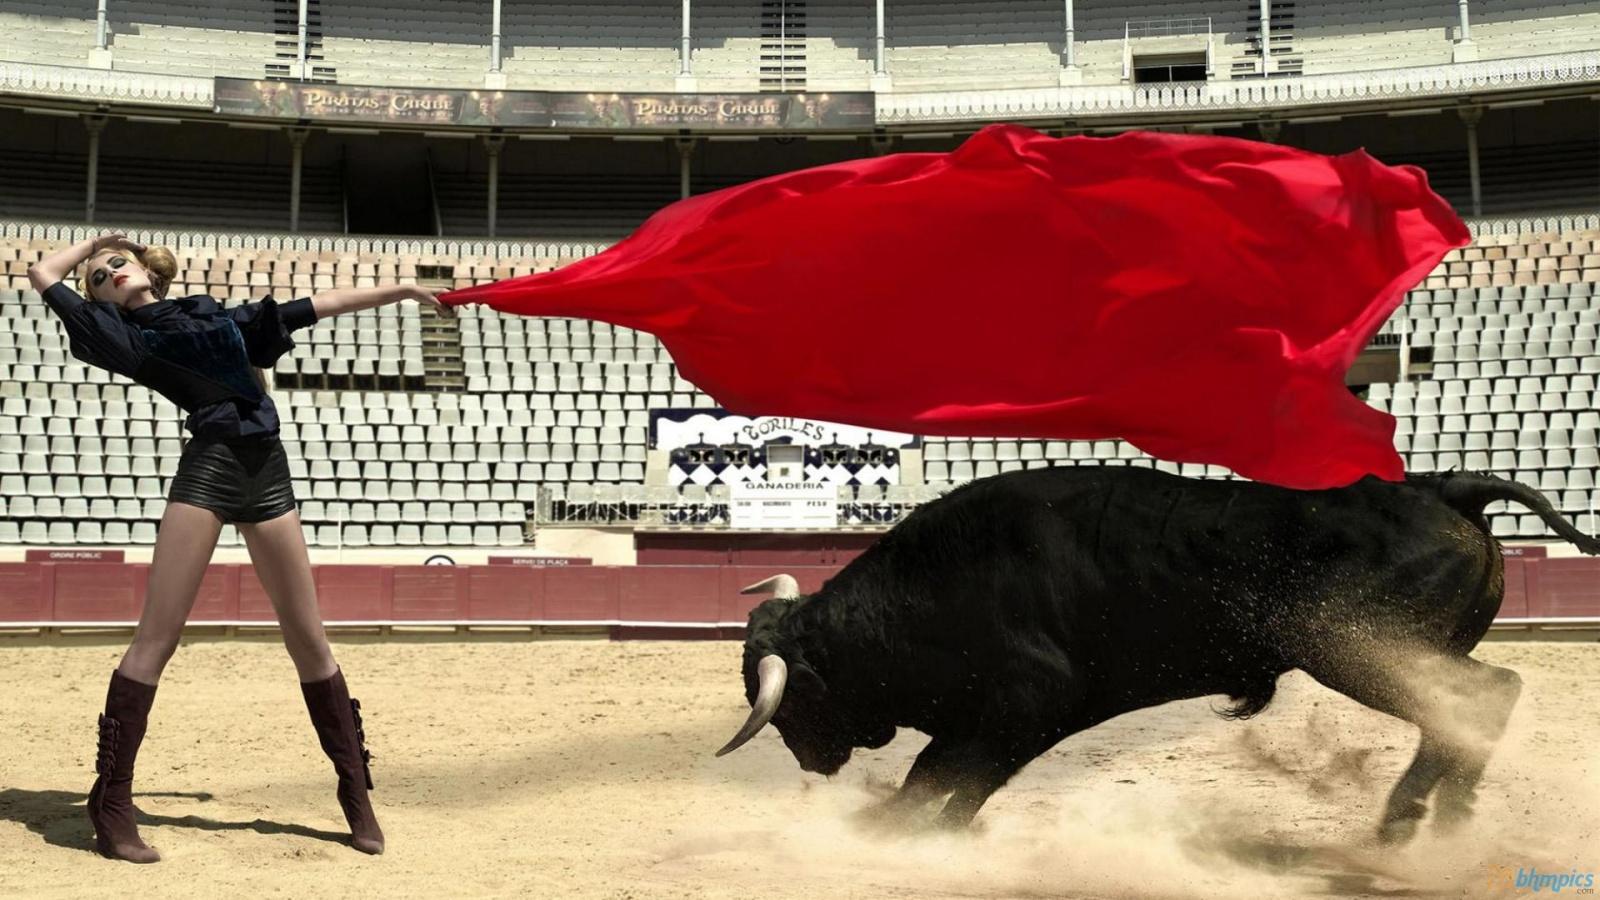 bull fighting 1920x1080 hd - photo #17